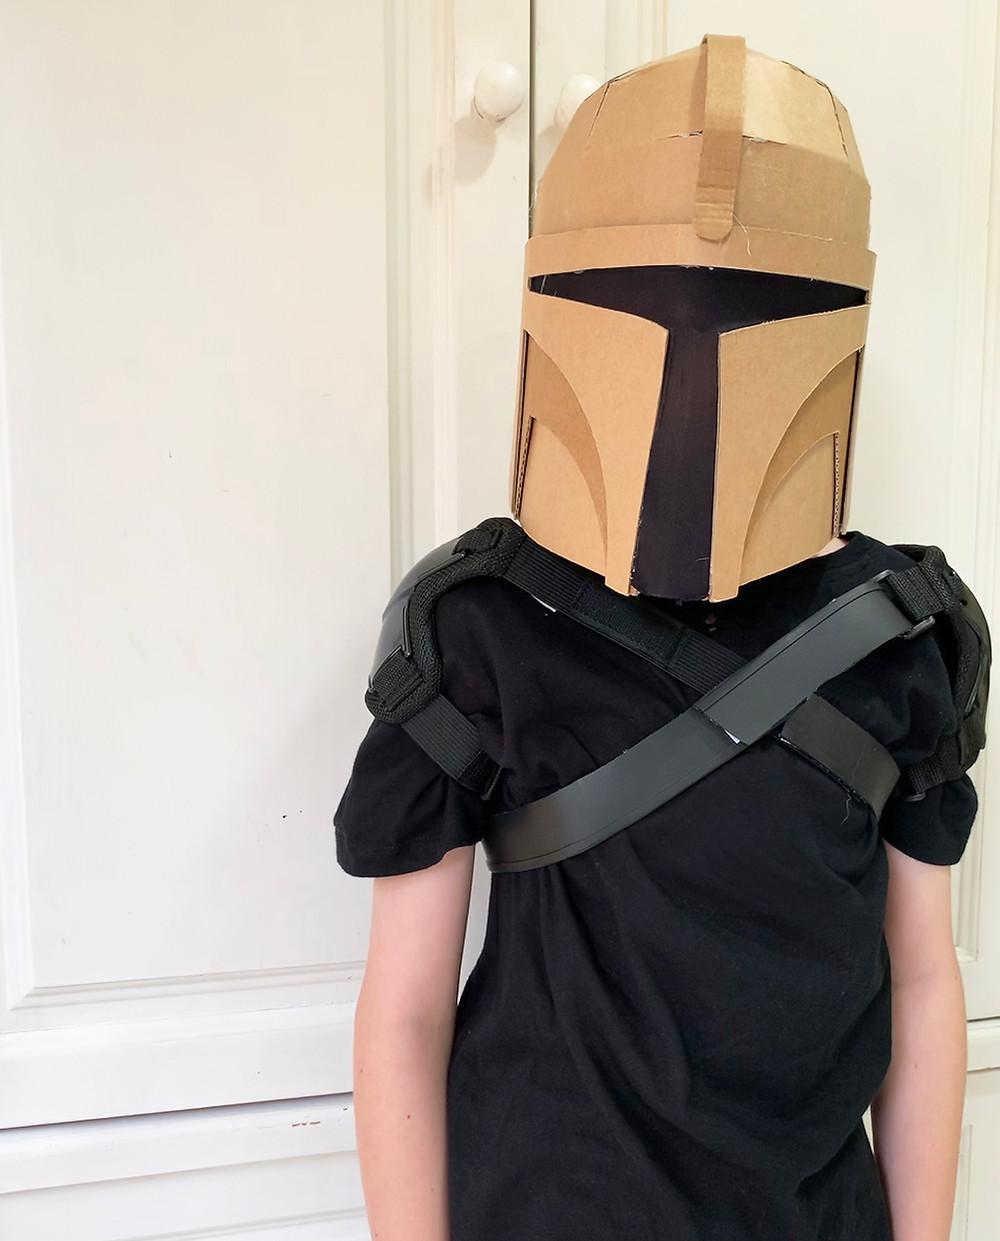 kids cardboard bounty hunter helmet made from a digital template.